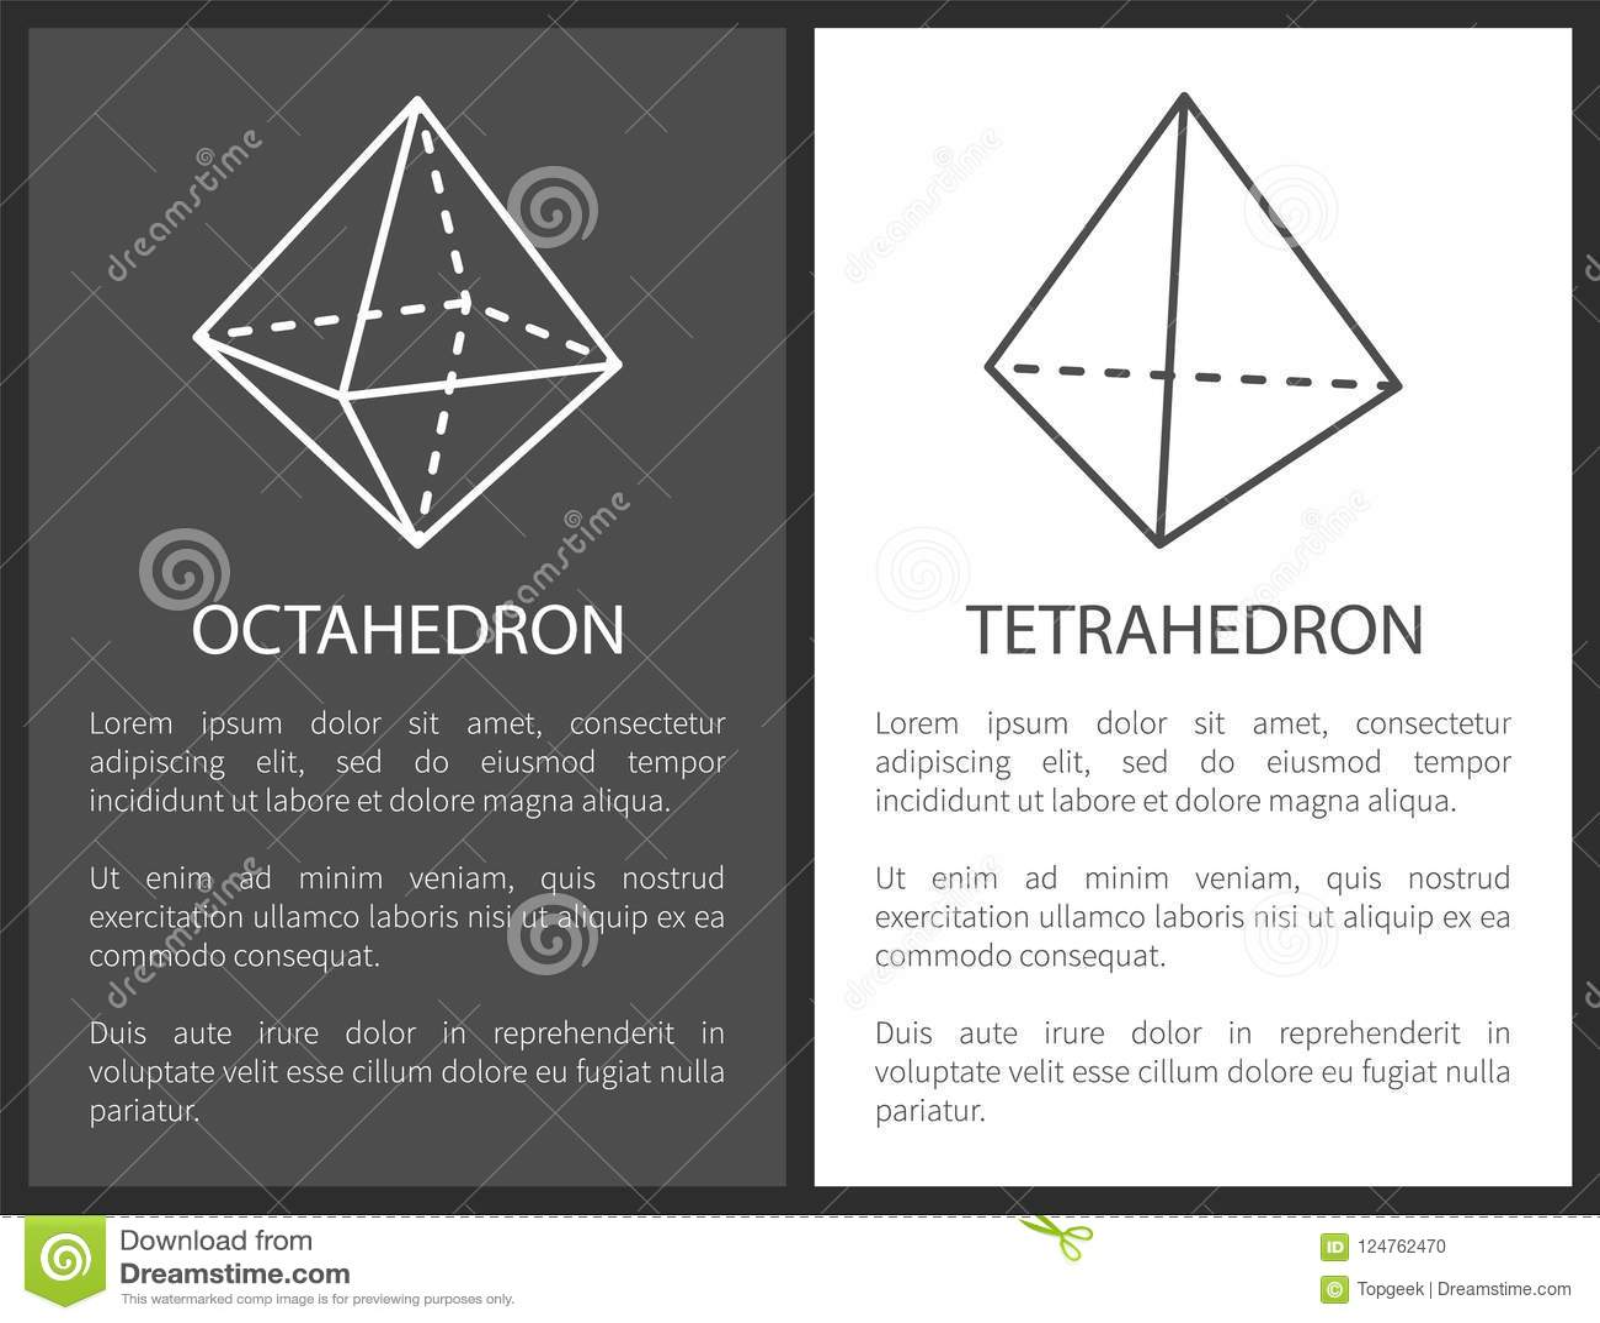 Octahedron And Tetrahedron Geometric Shapes Figure Stock